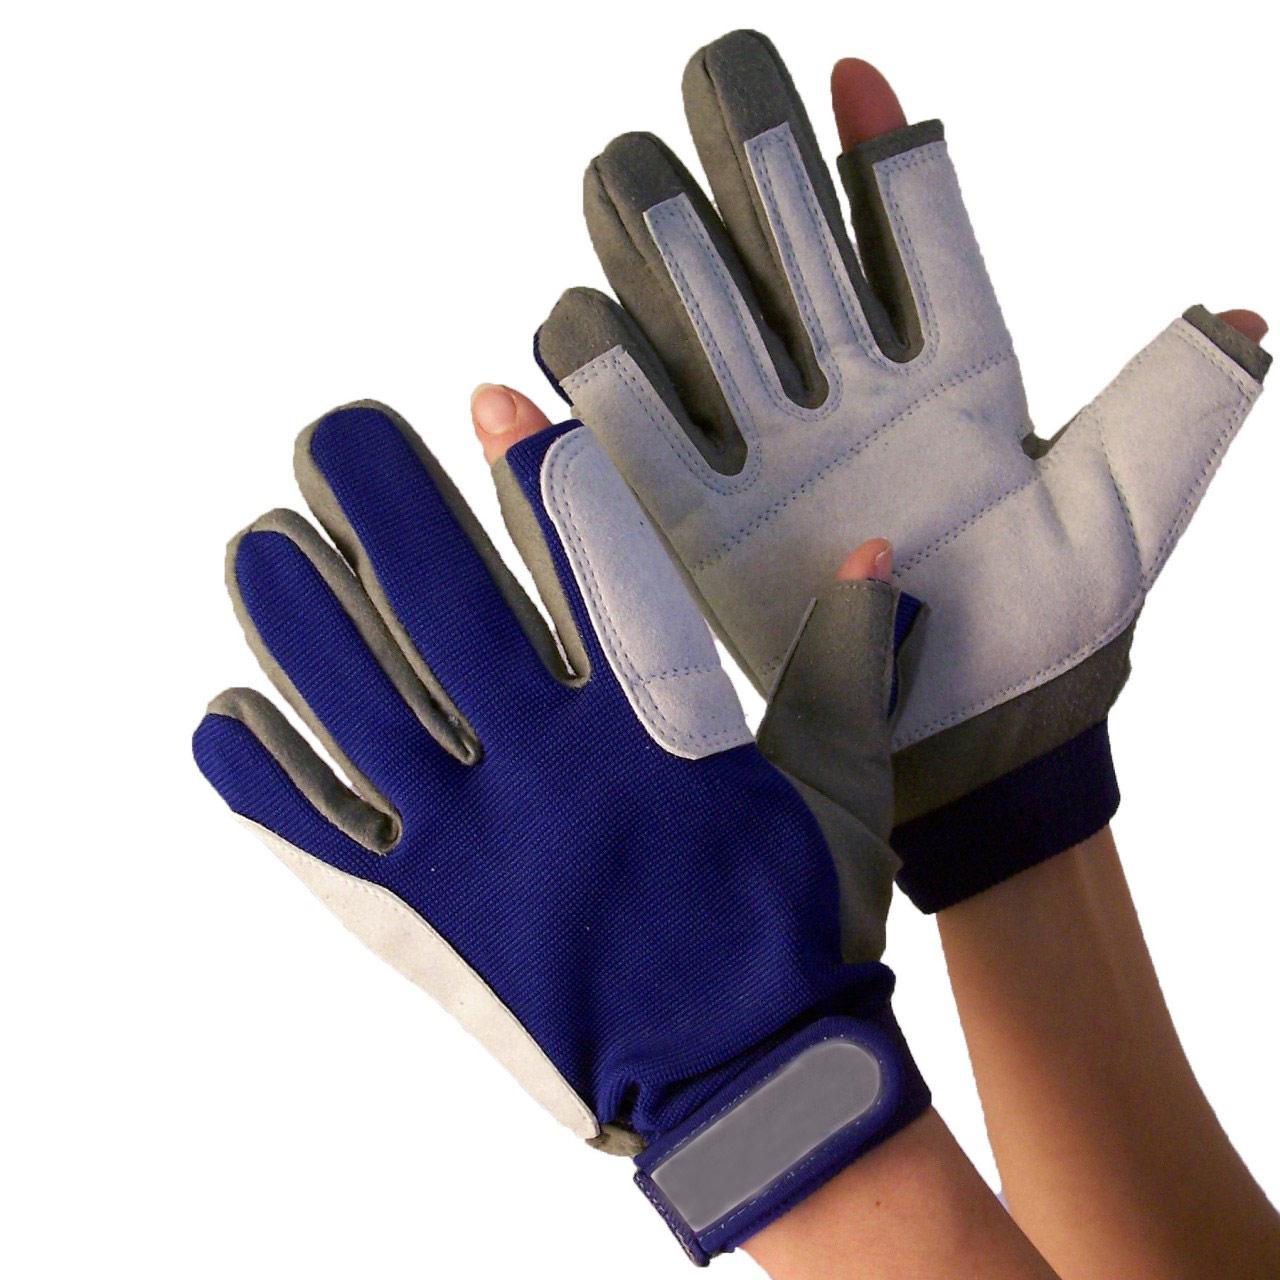 crazy4sailing Amara Kunstleder Segelhandschuhe Racing 5 Finger frei Segeln Glove Bekleidung Handschuhe